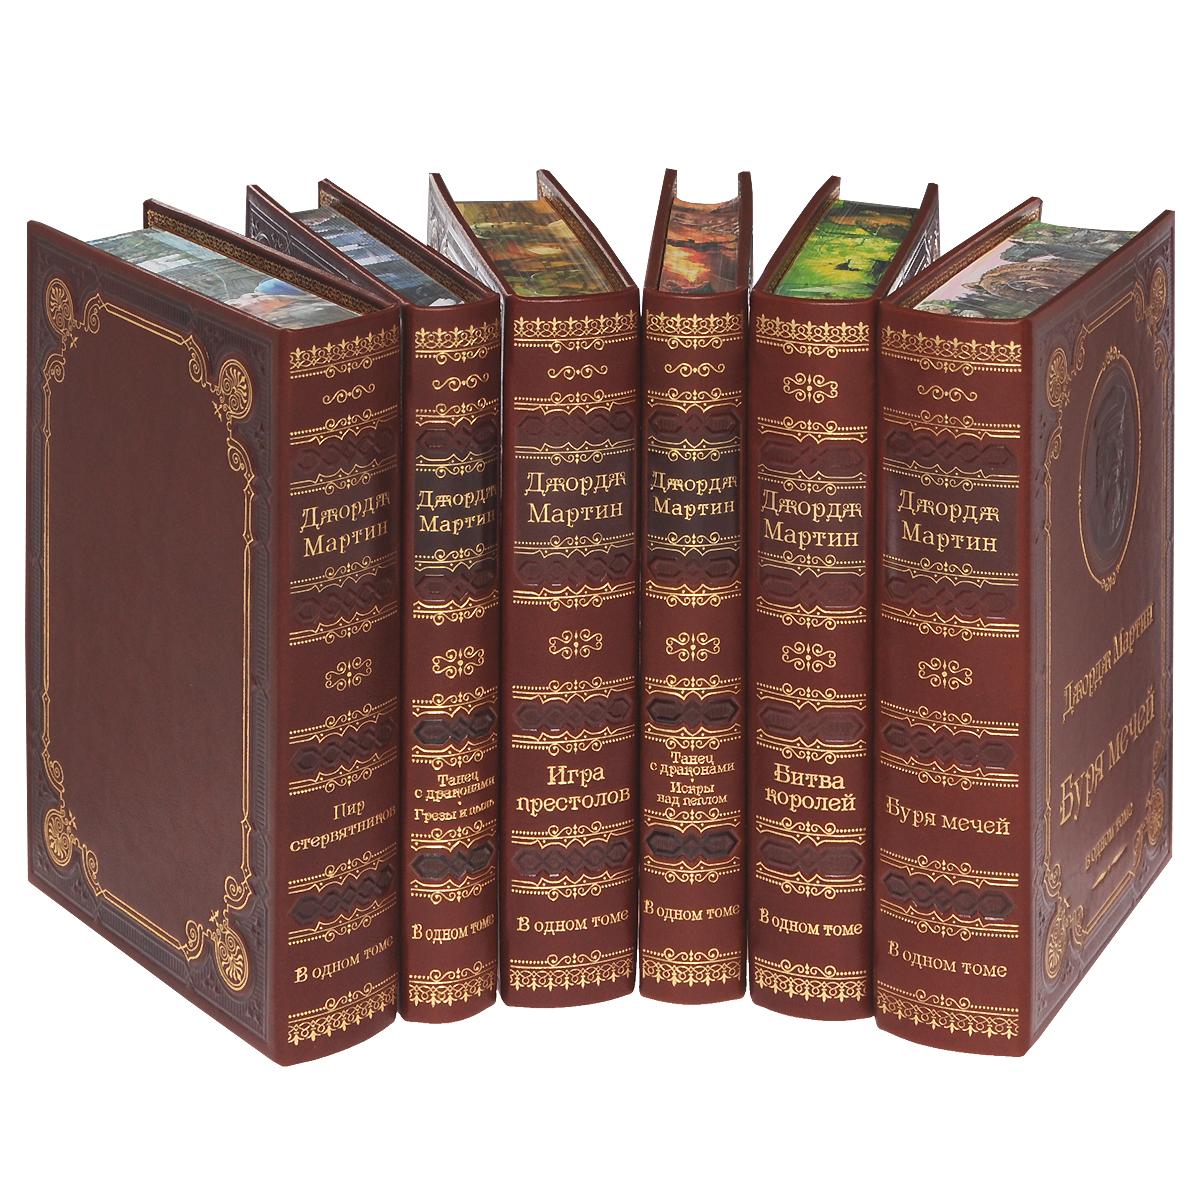 Джордж Мартин (подарочный комплект из 6 книг)